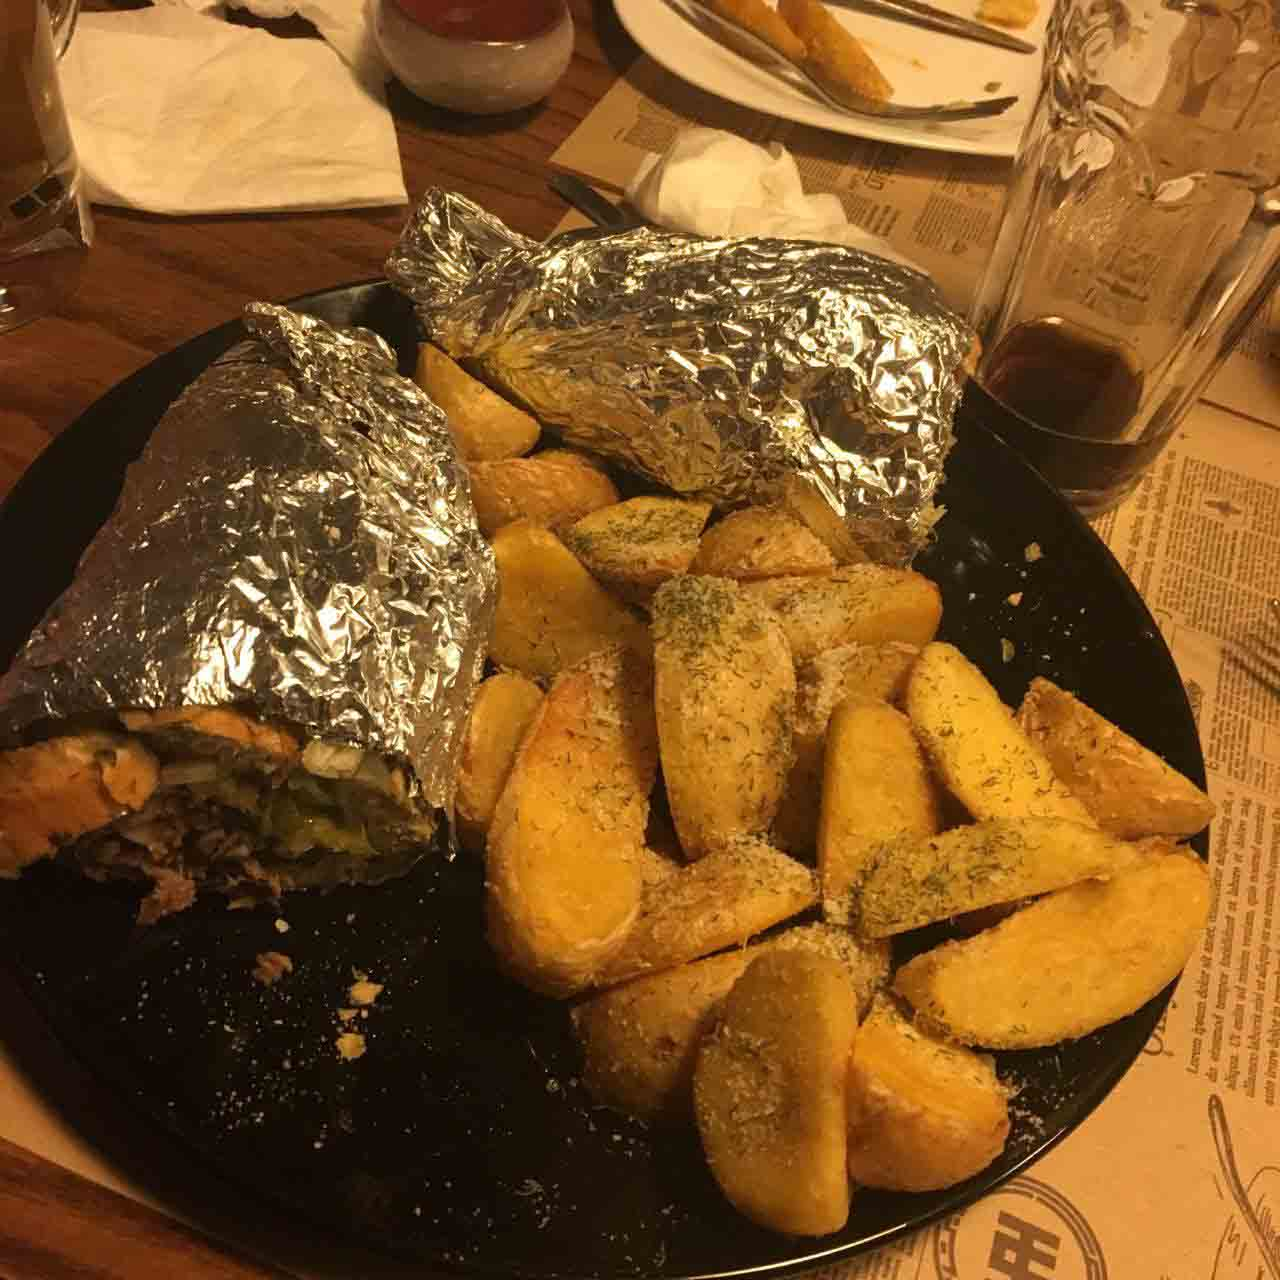 عکس پروفایل ایتالیایی کافه رستوران تکسین